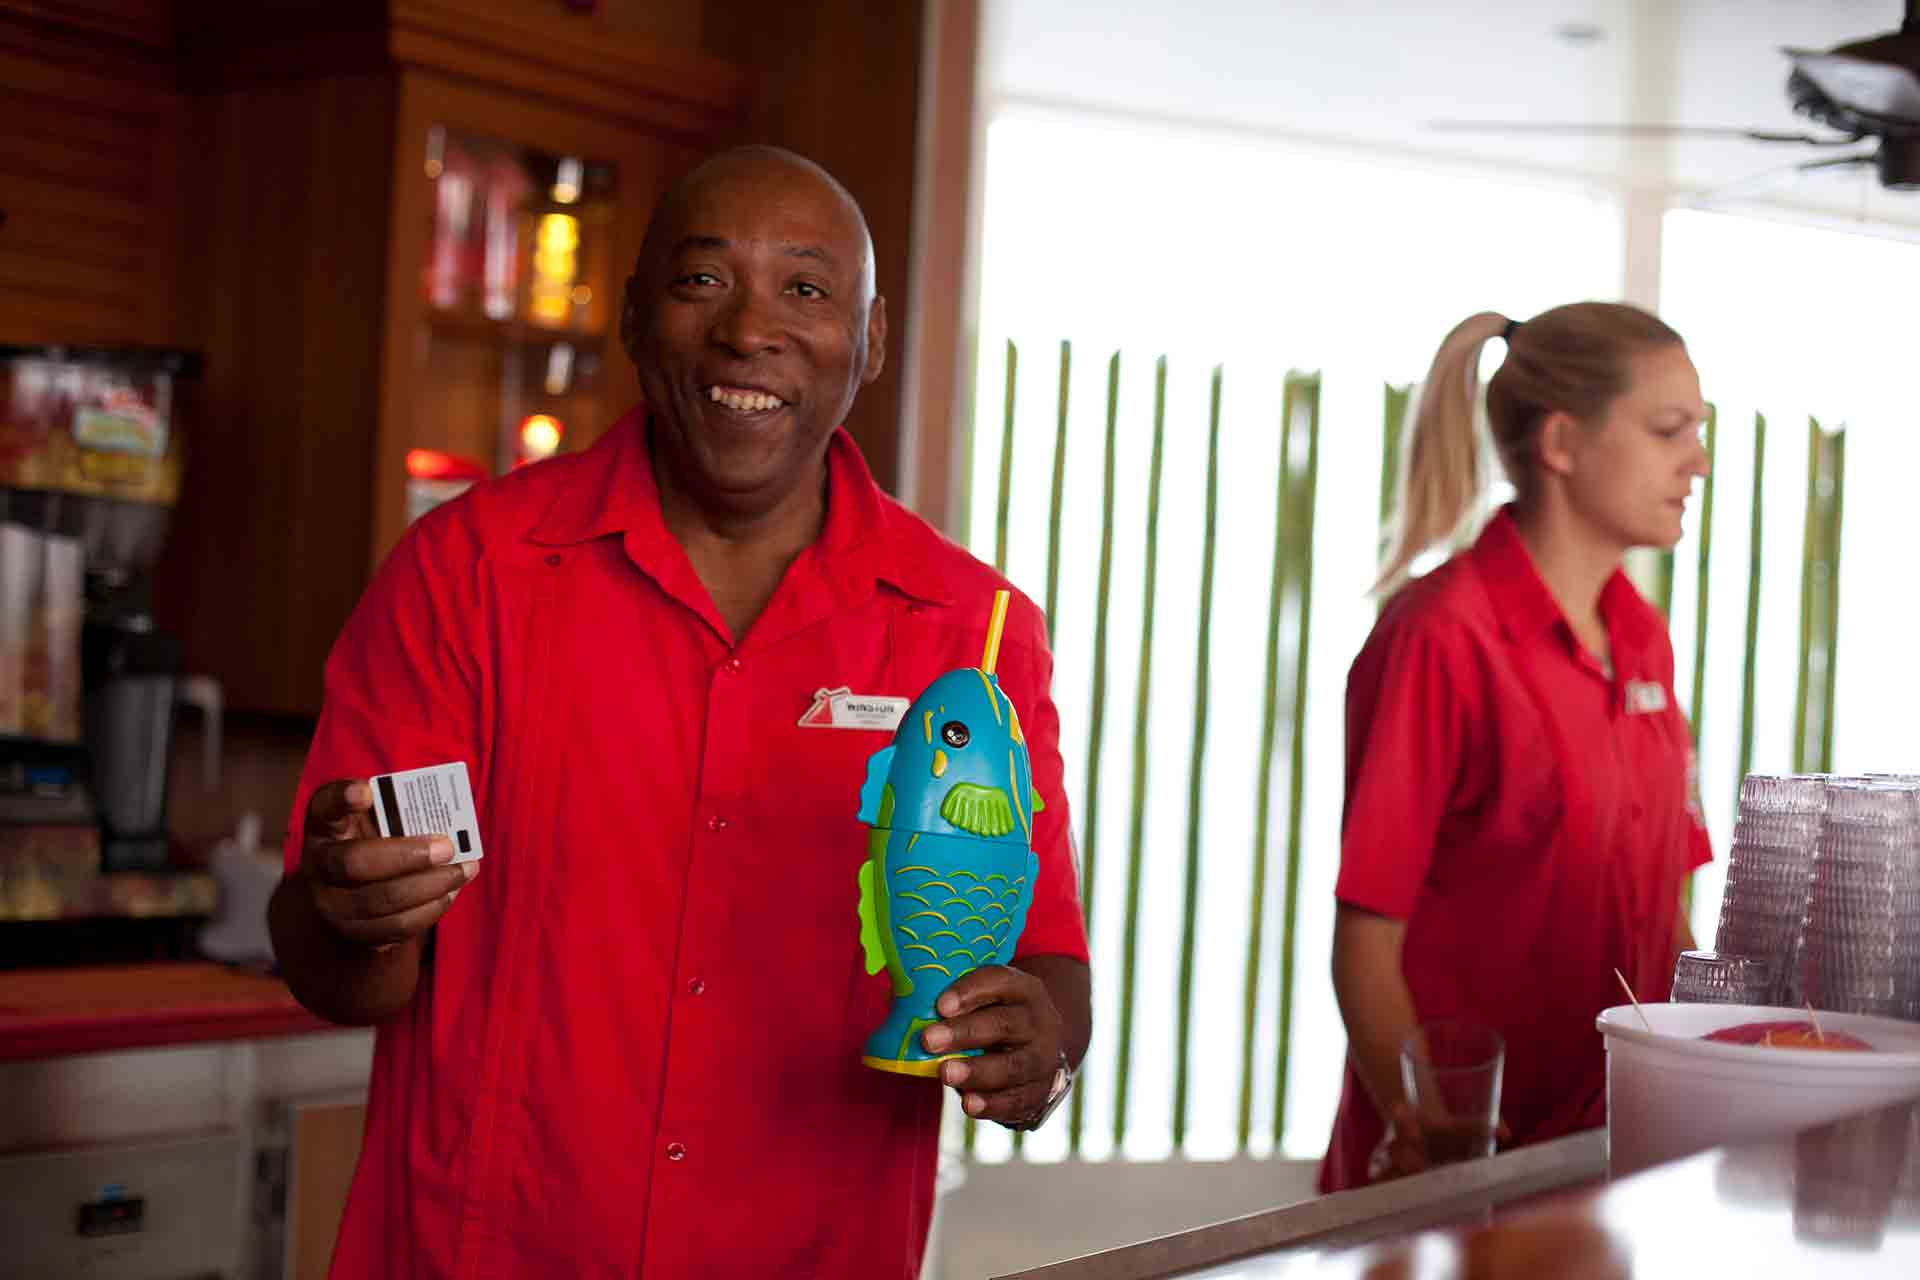 crew member serving a drink onboard